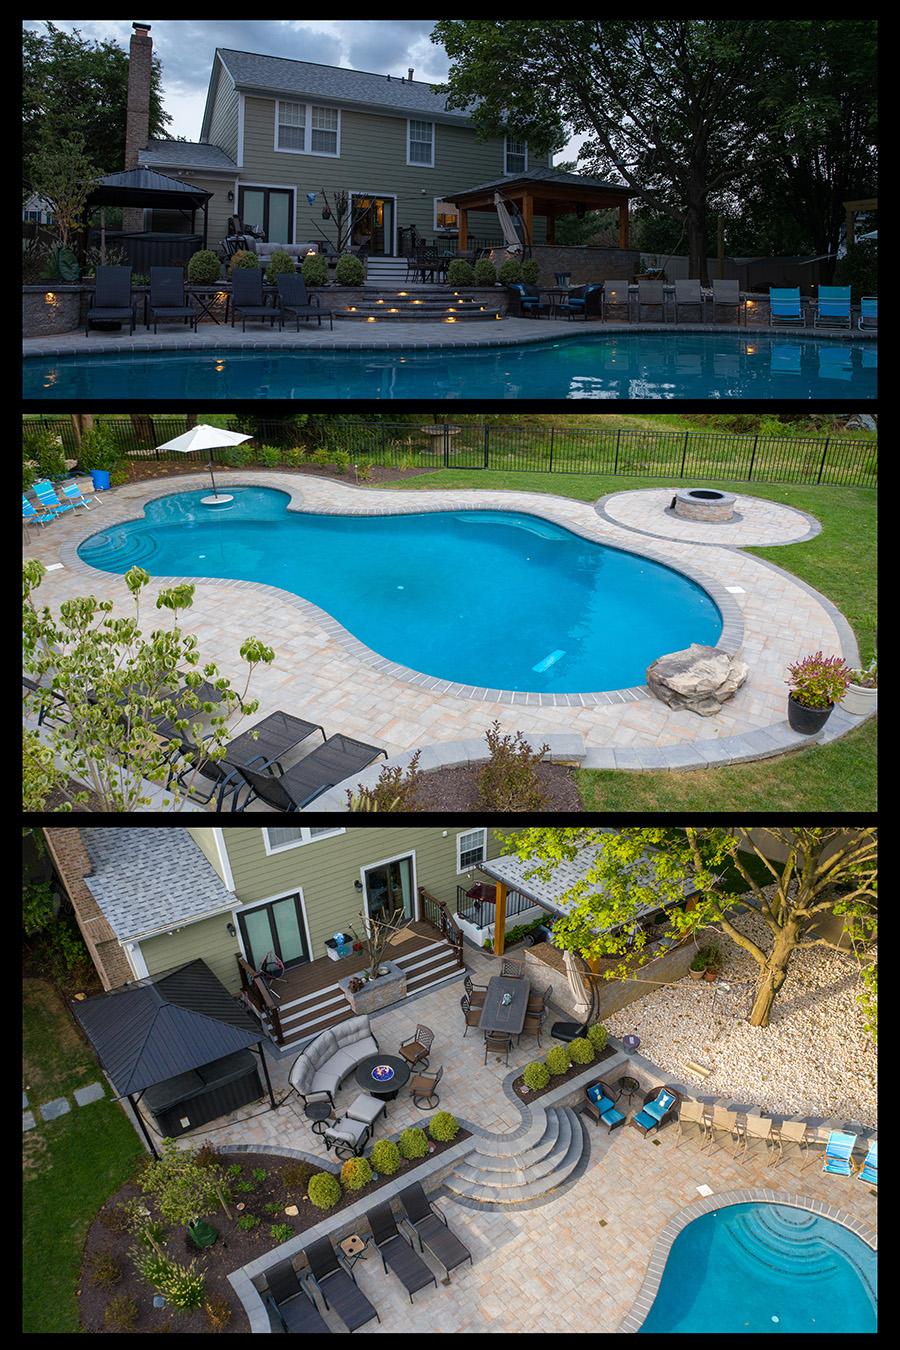 Rhine pools builder in carroll county